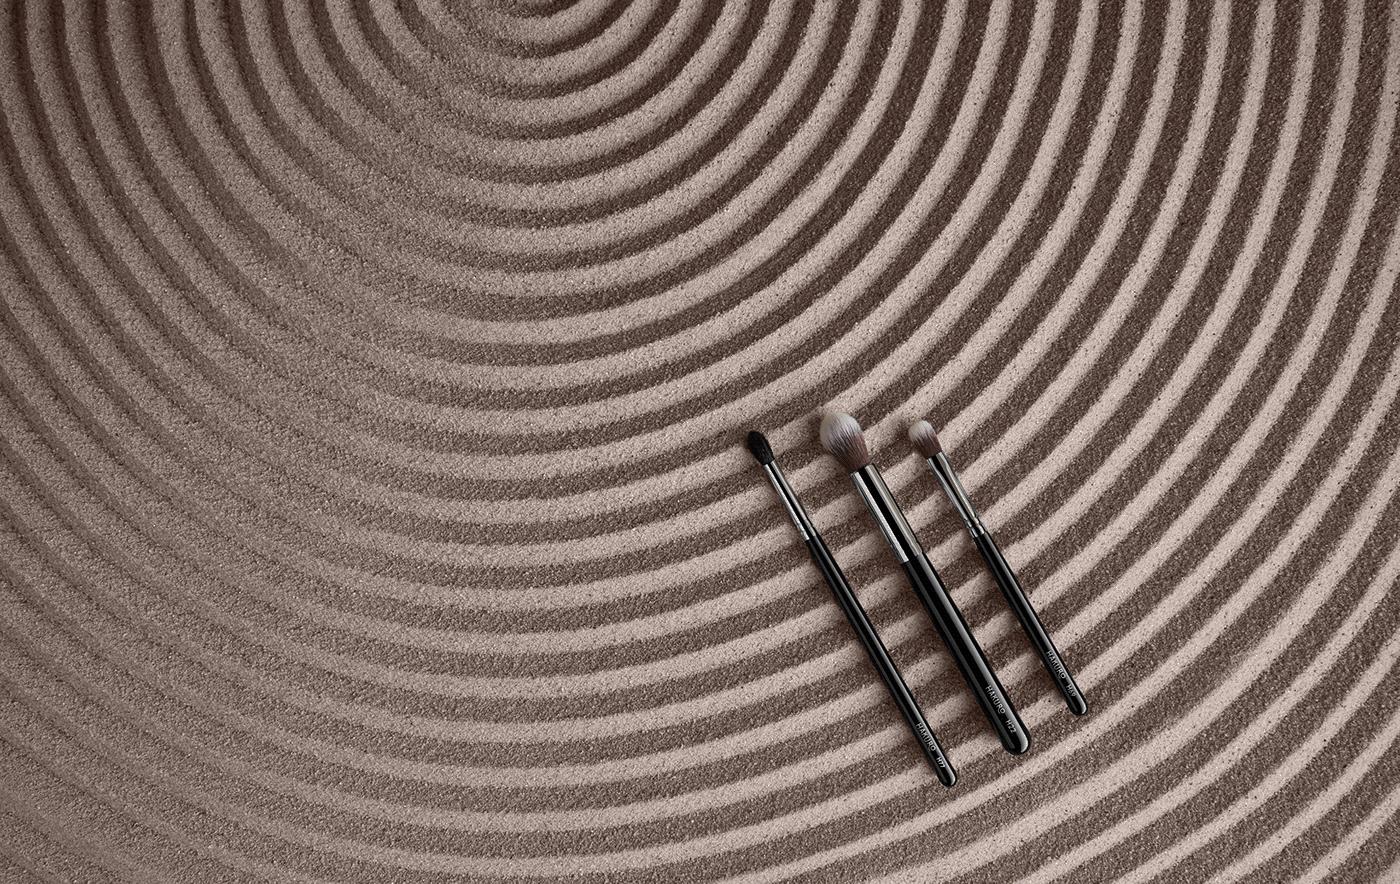 beauty brush brushes hakuro ILLUSTRATION  makeup Packaging Rebranging